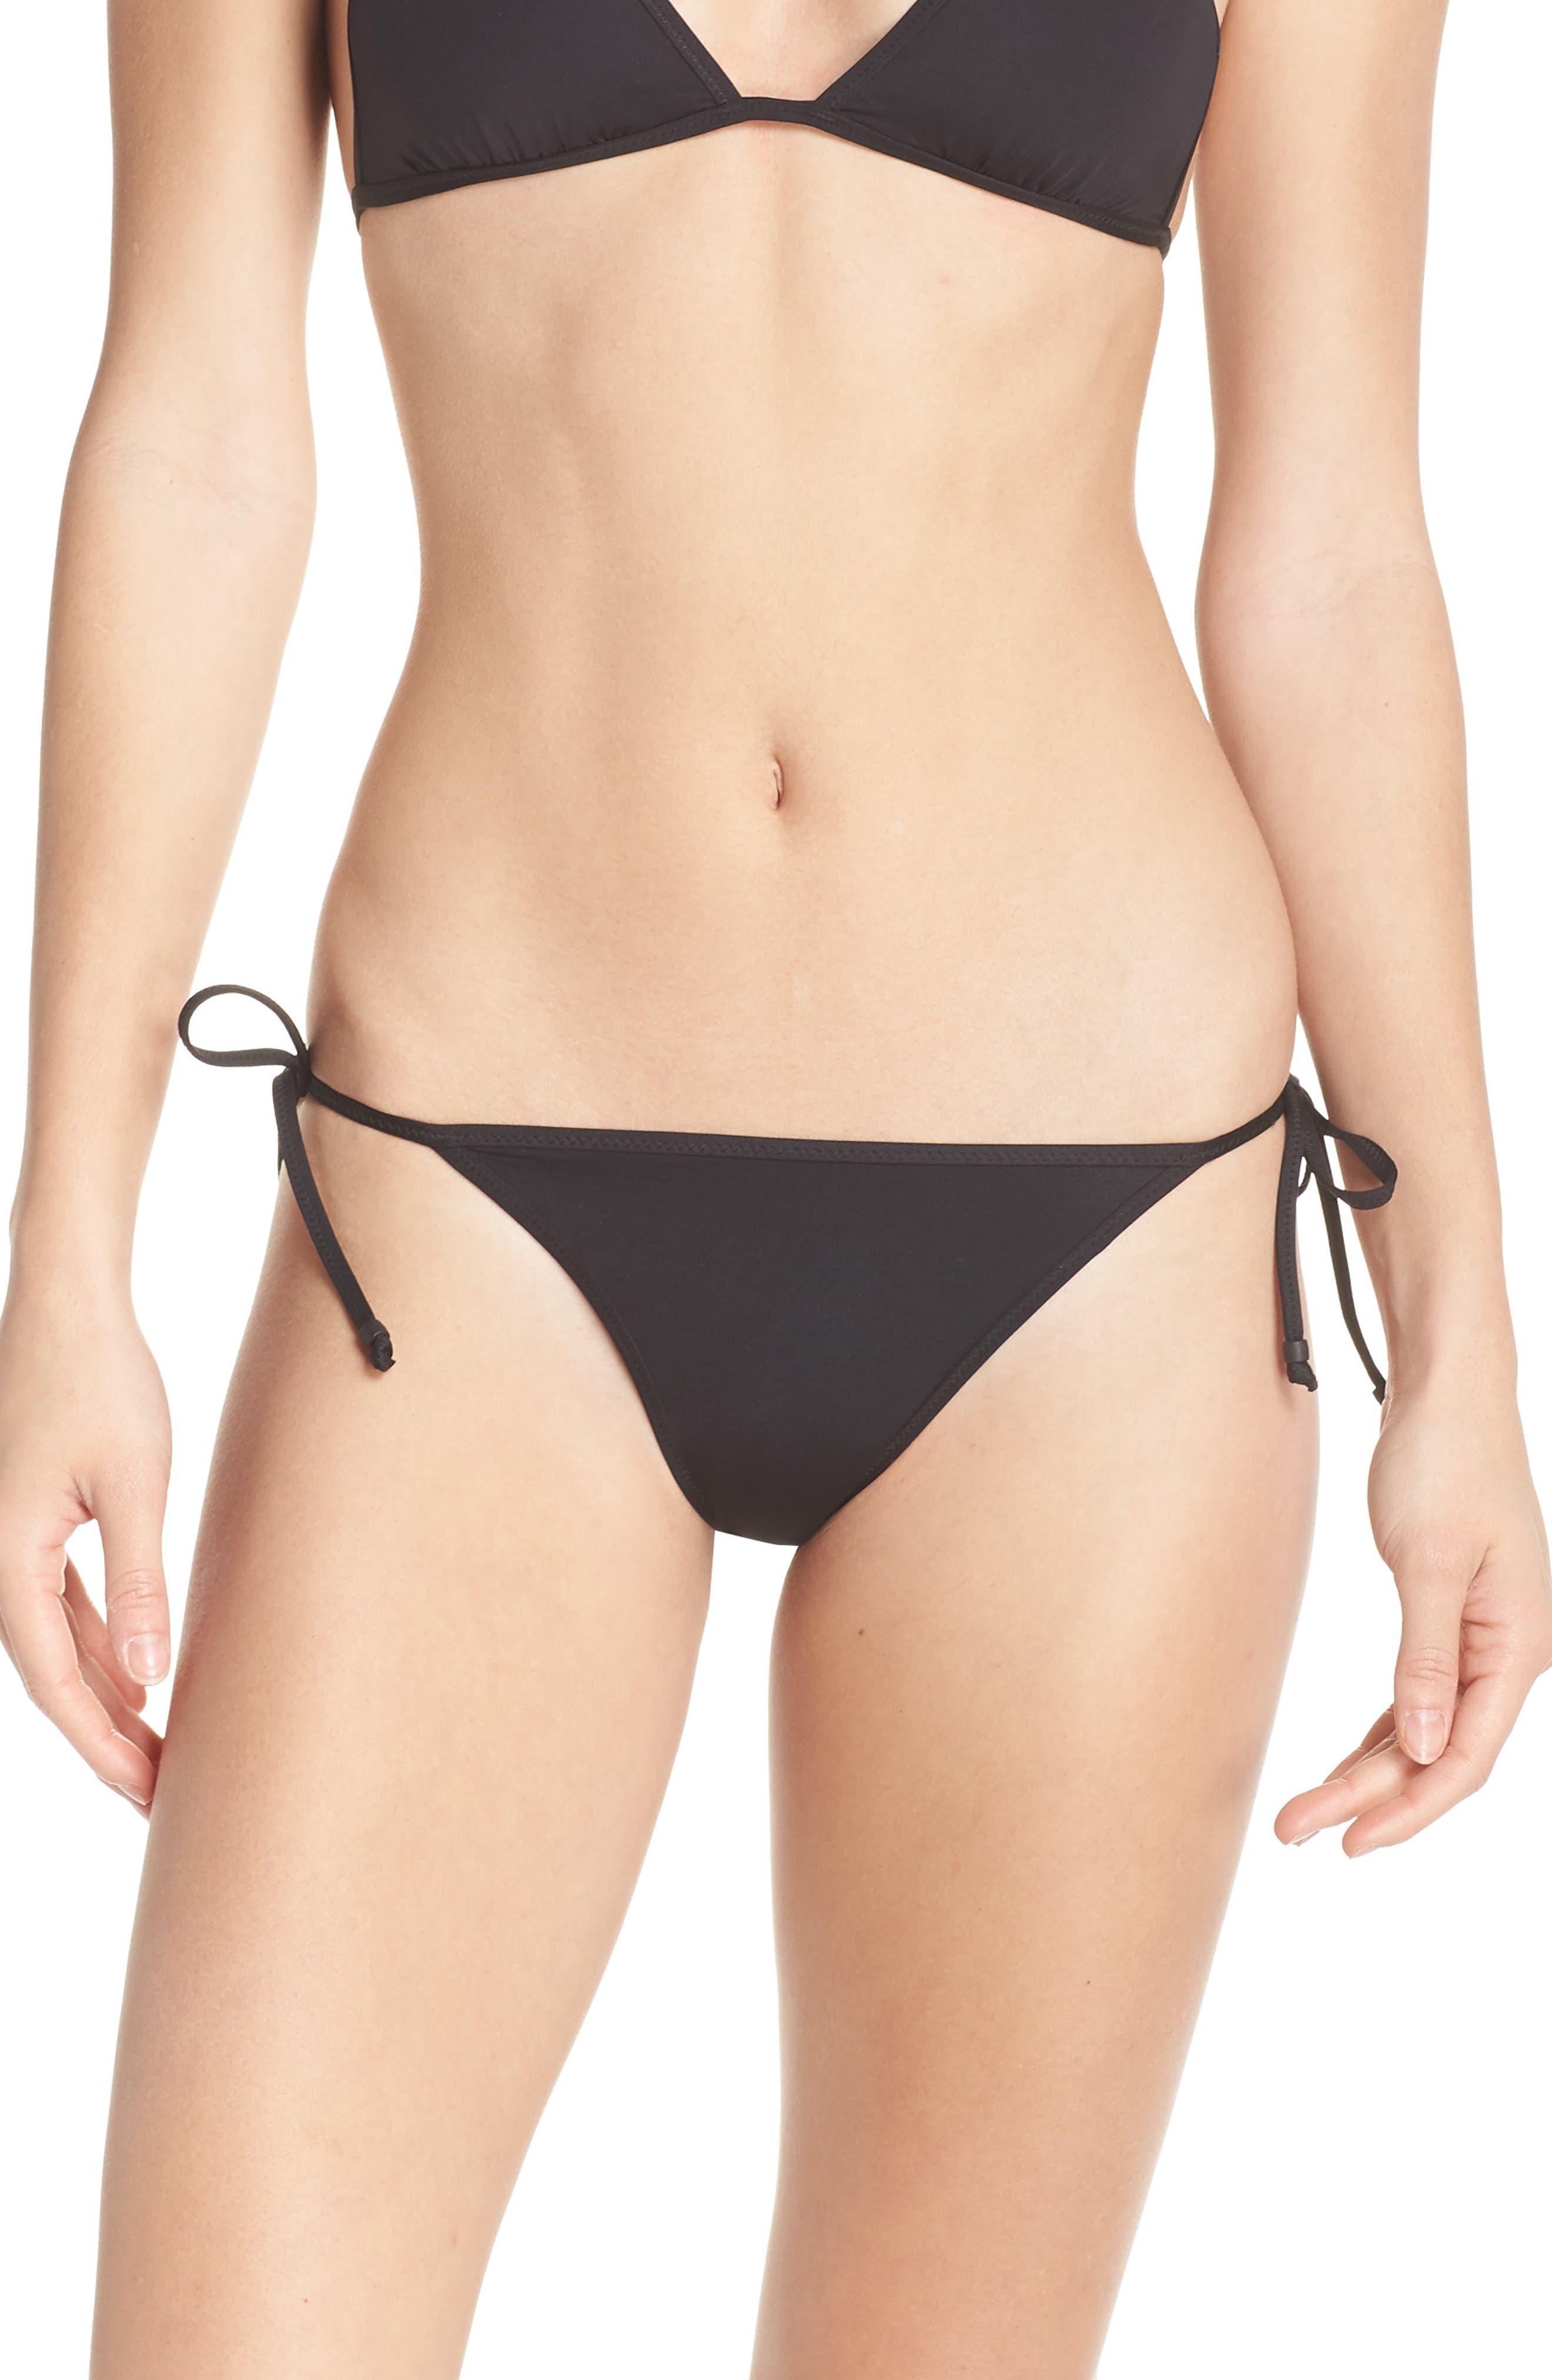 Playa Miami String Bikini Bottoms,                             Main thumbnail 1, color,                             001